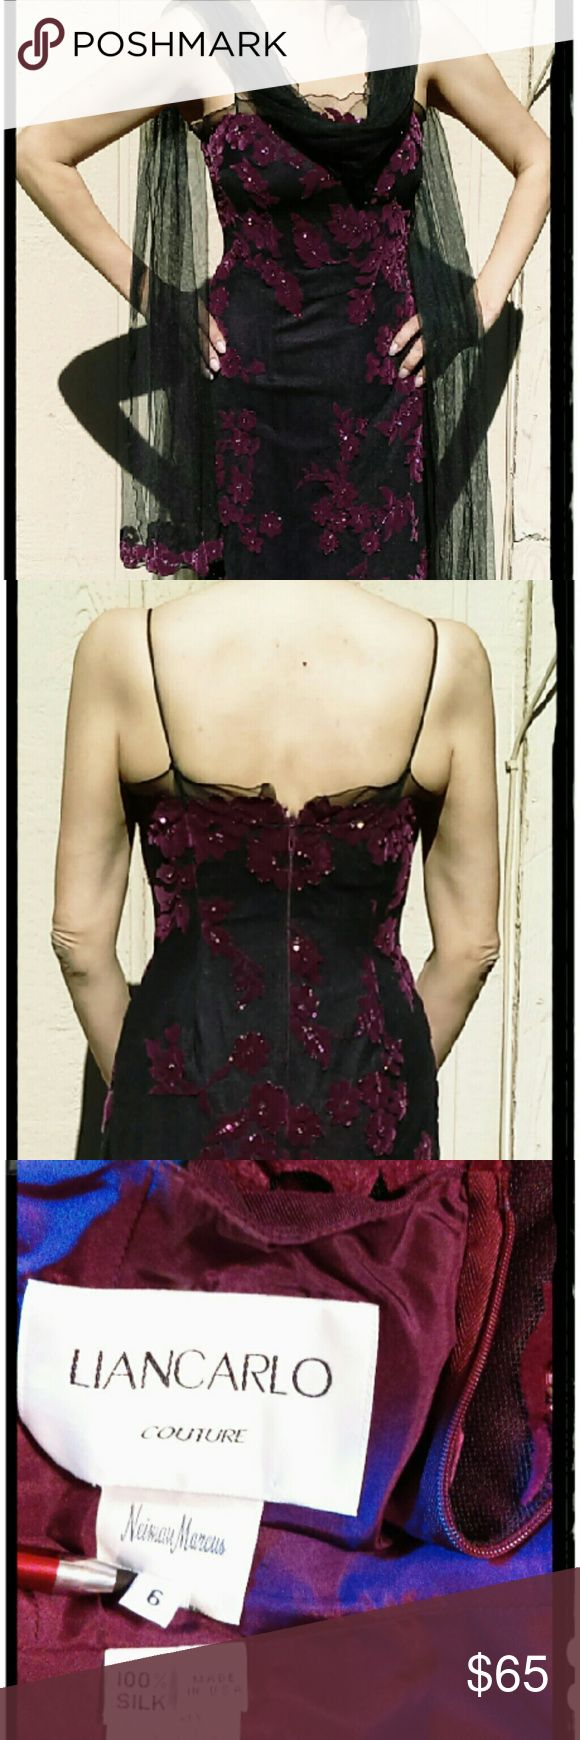 Black dress neiman marcus - Liancarlo Couture Neiman Marcus Evening Dress Sz 6 Black Plum Burnt Out Sequined Dress